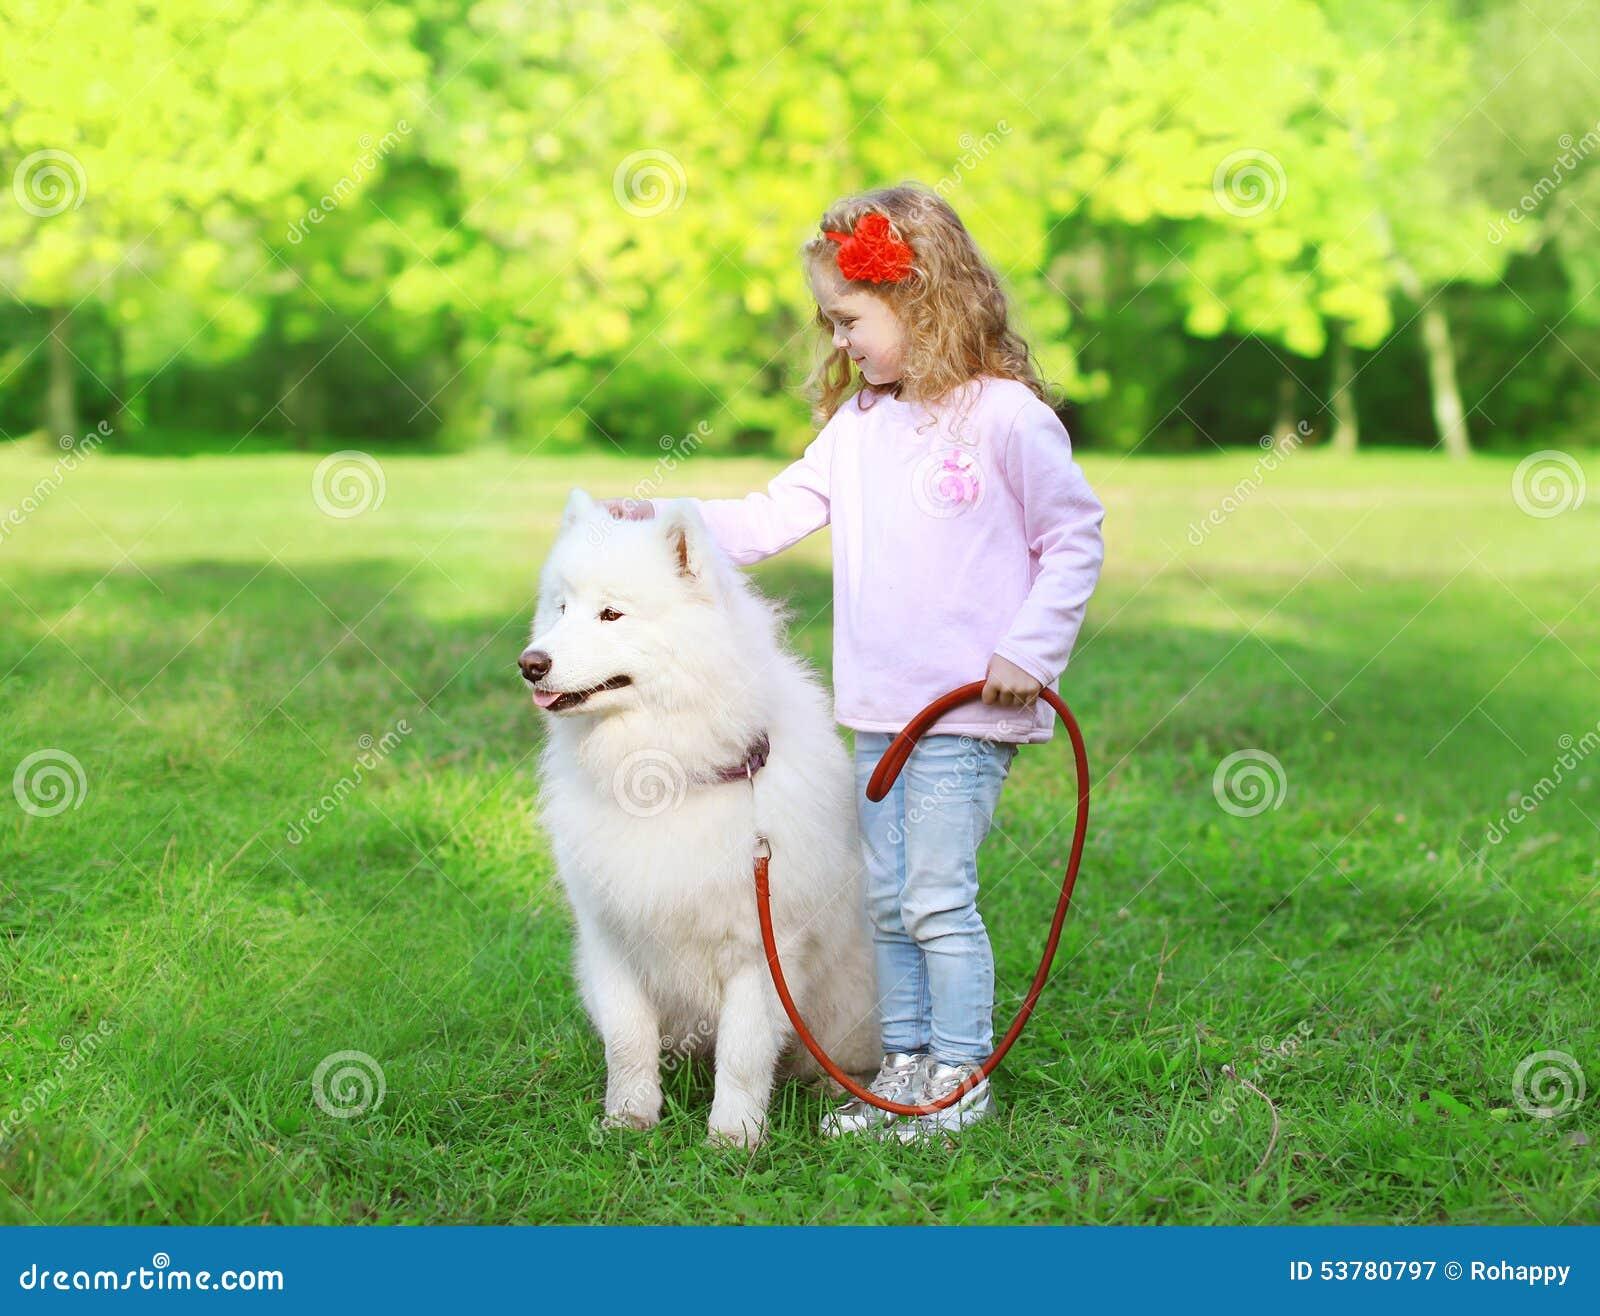 Dziecko z białym Samoyed psem na gras